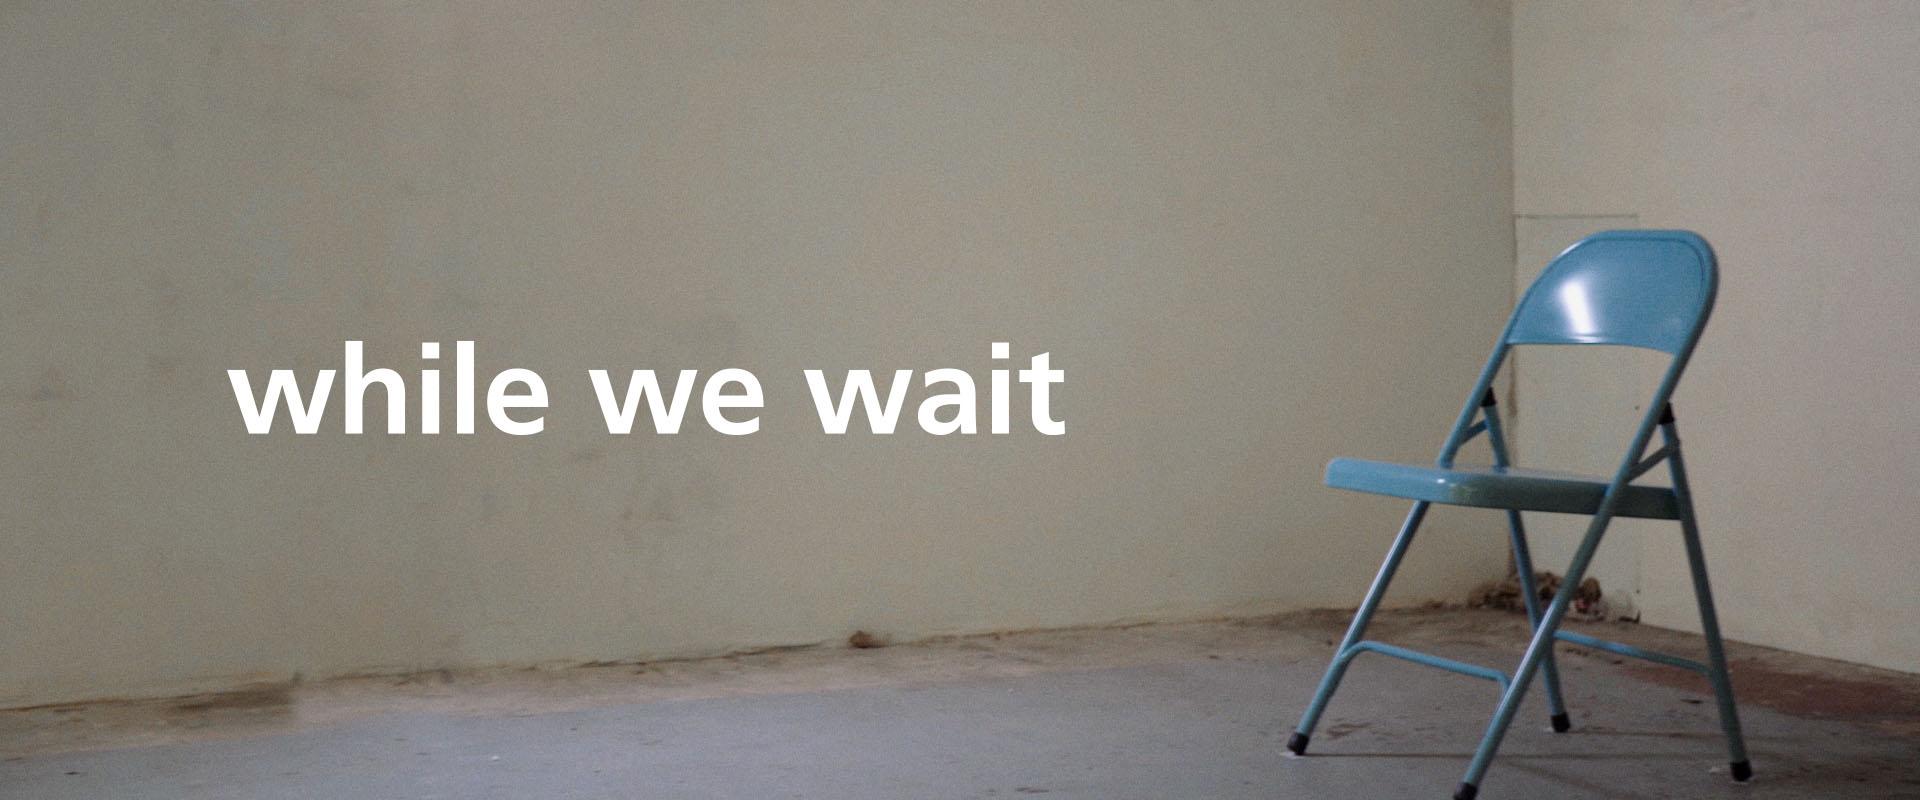 while we wait documentary